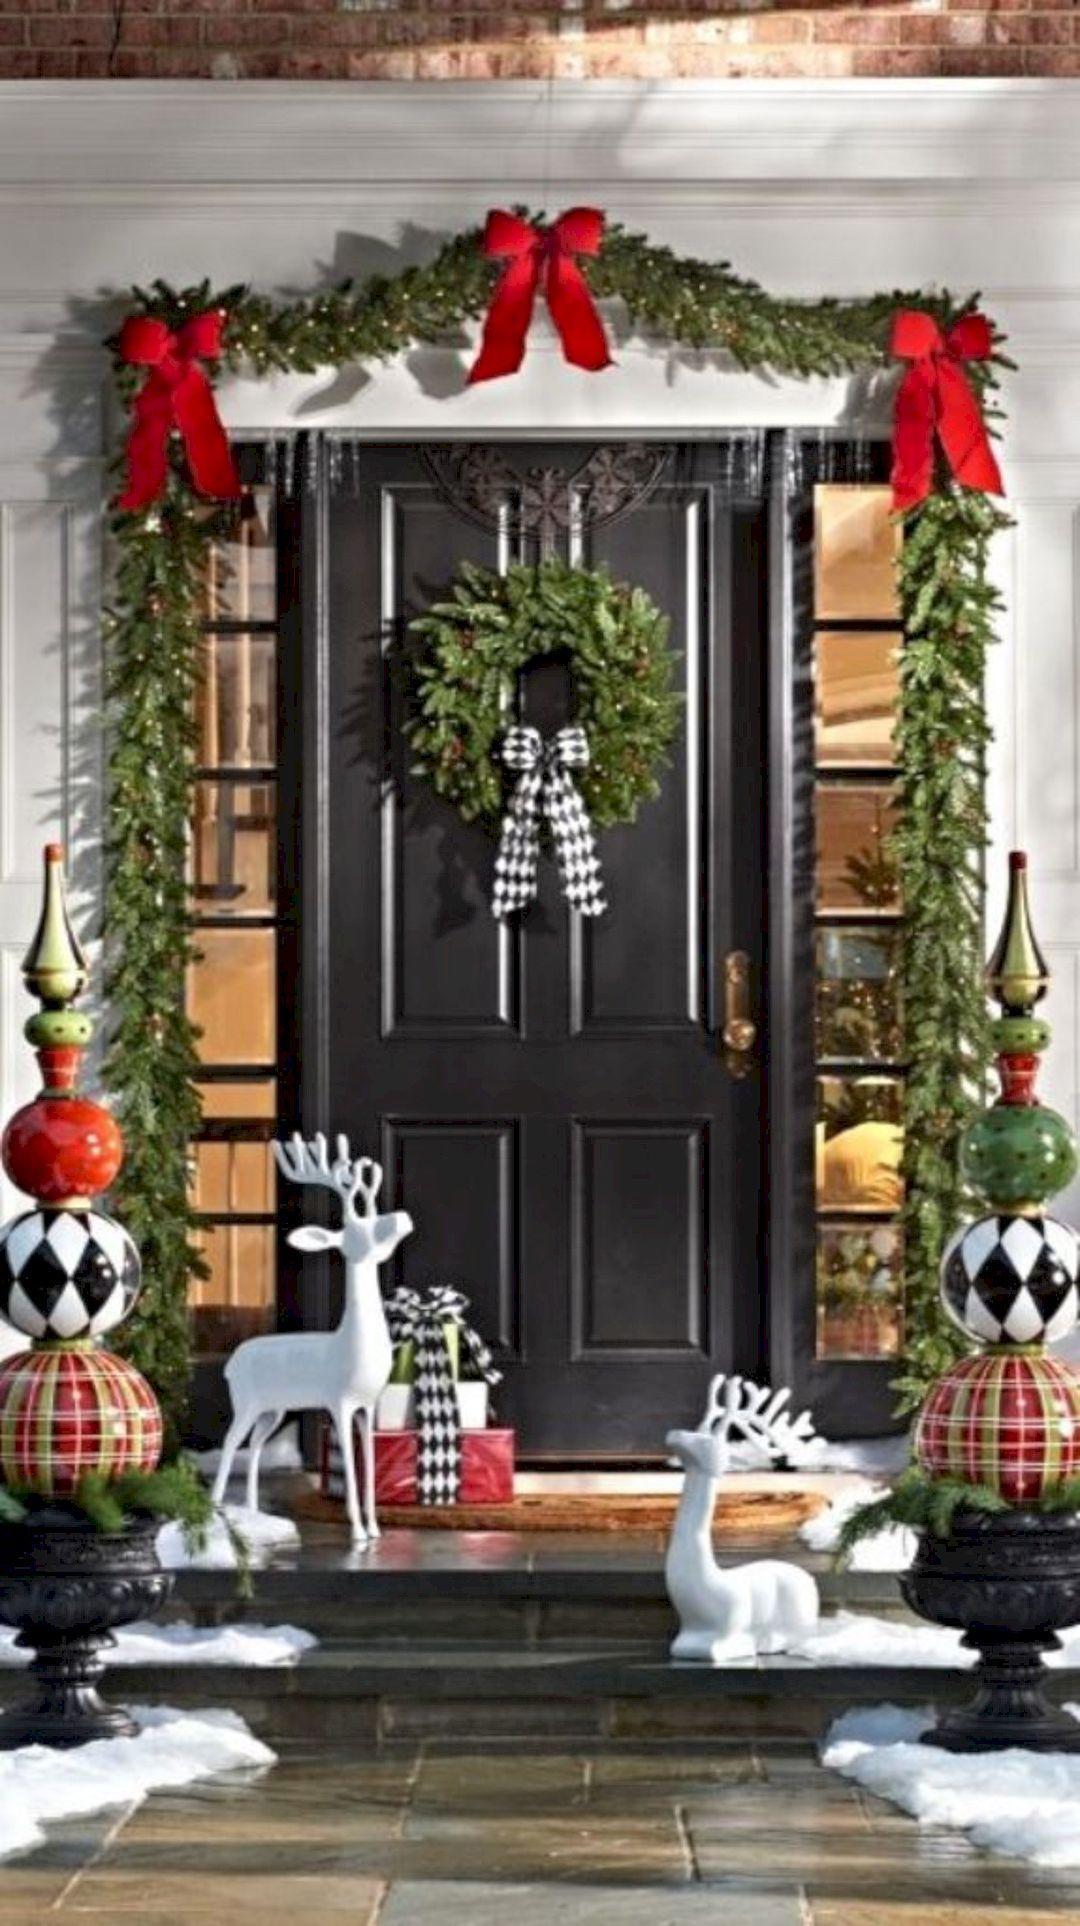 16 Cheerful Christmas Door Decorating Ideas Https Www Futuristarchitecture Com Classic Christmas Decorations Christmas Door Decorations Christmas Porch Decor